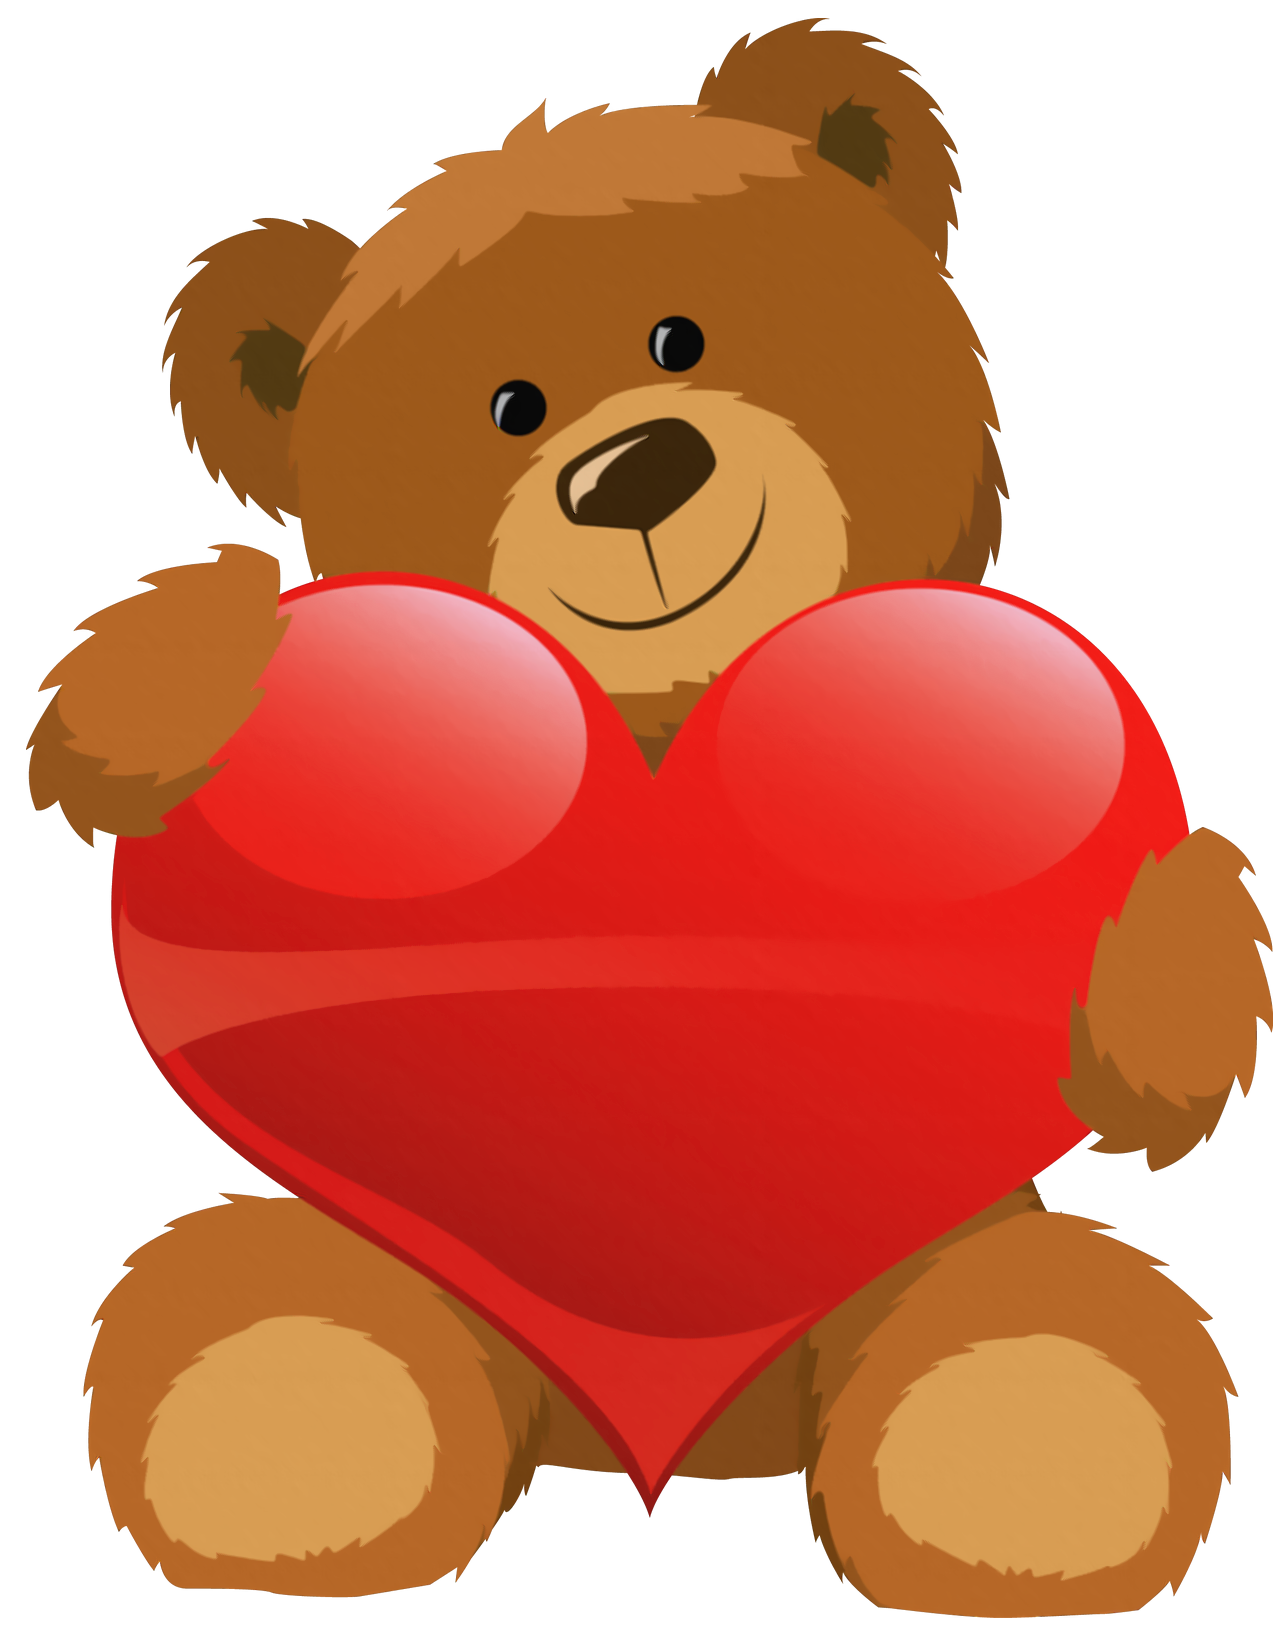 hight resolution of teddy bear cute bear cute teddy clipart clipartmonk free clip art images 2 bear cartoon